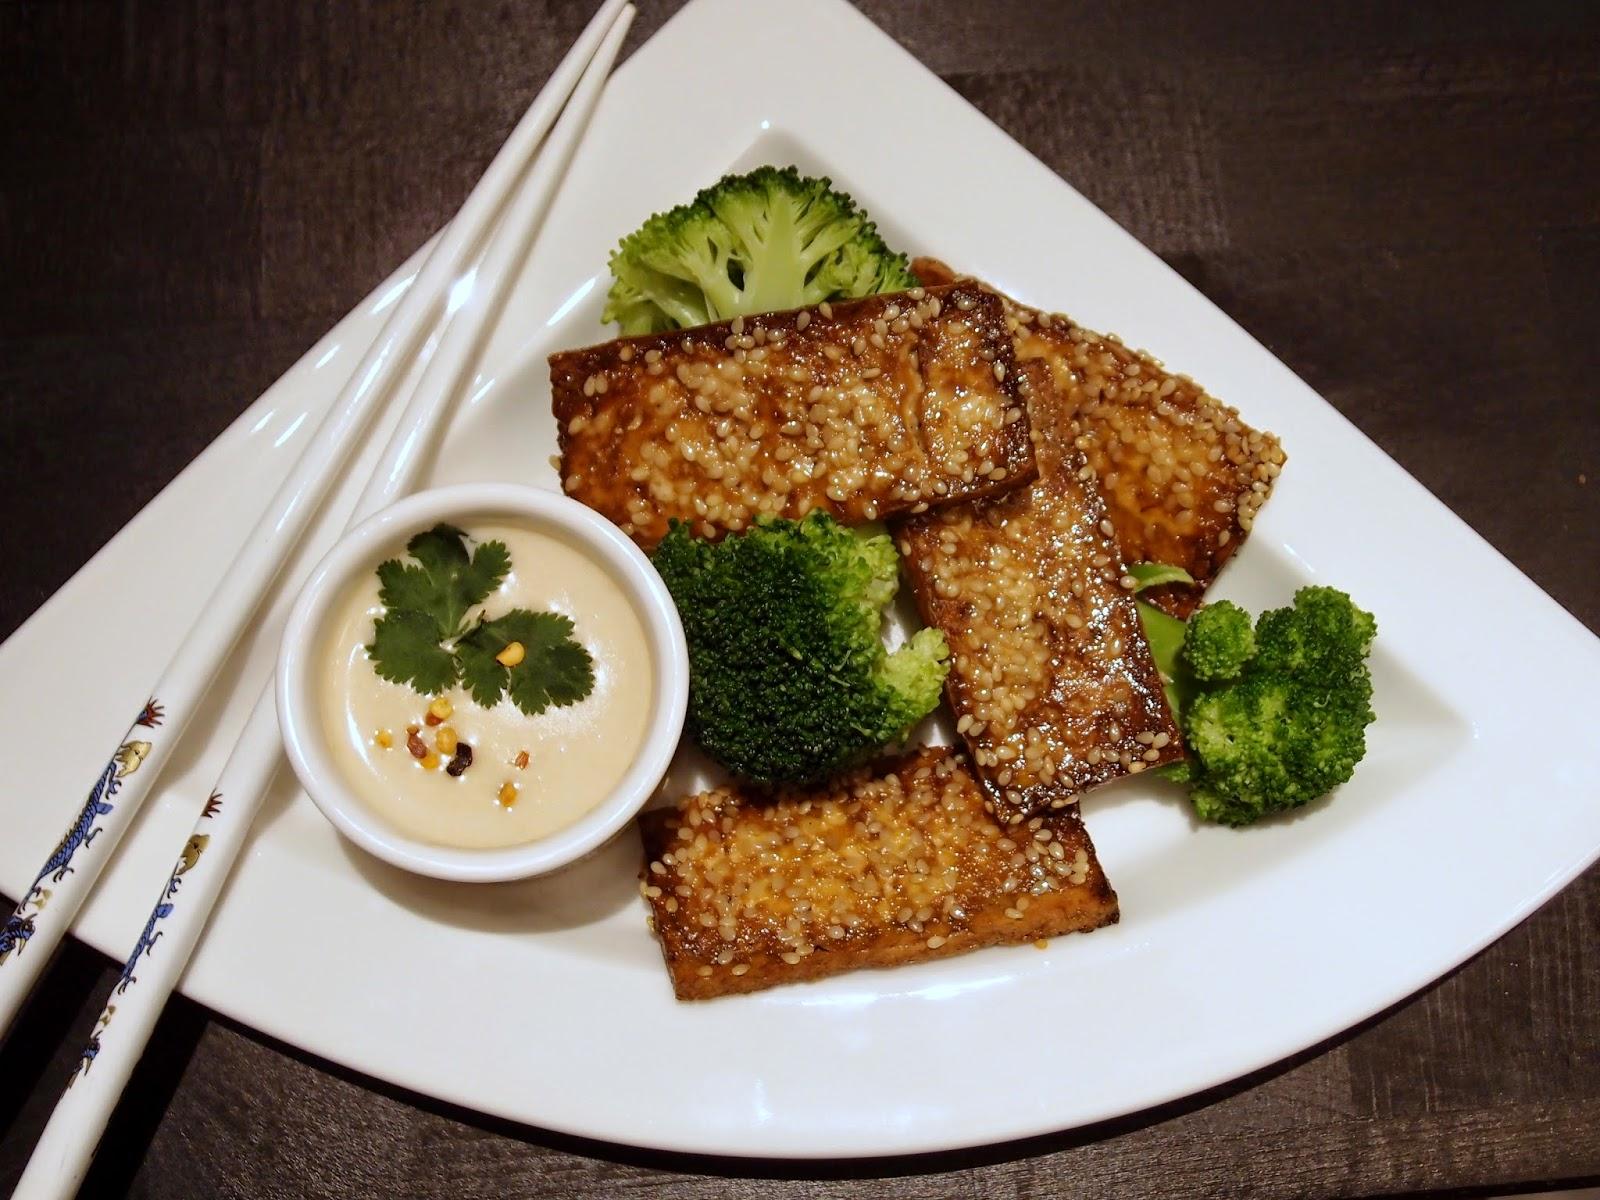 The VegHog: Sesame-roasted tofu with satay sauce and broccoli